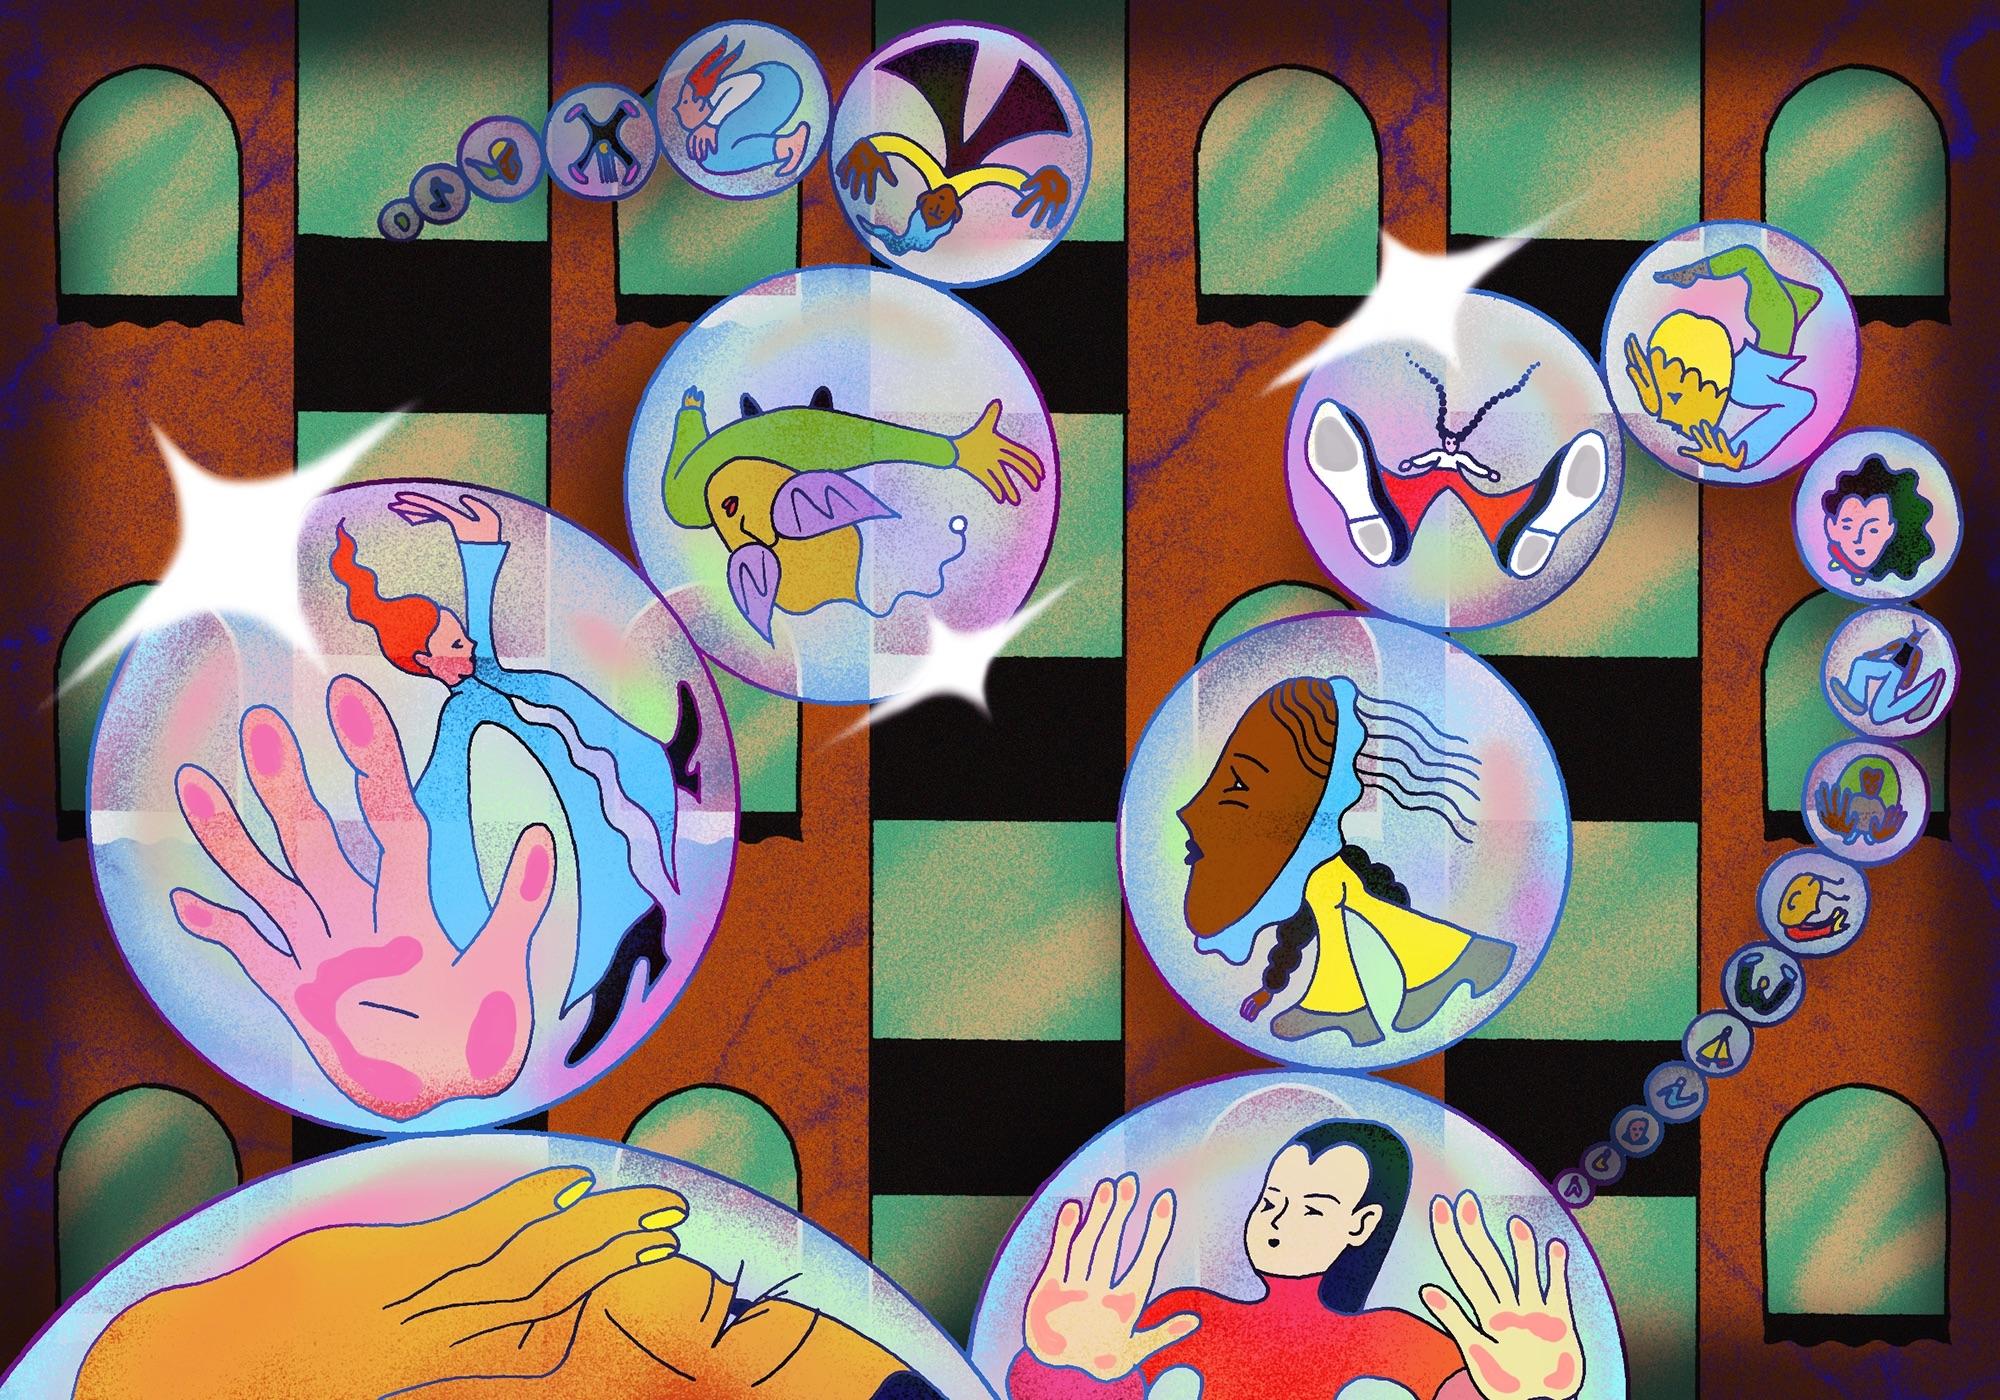 Illustration by Amina Bouajila for Elephant